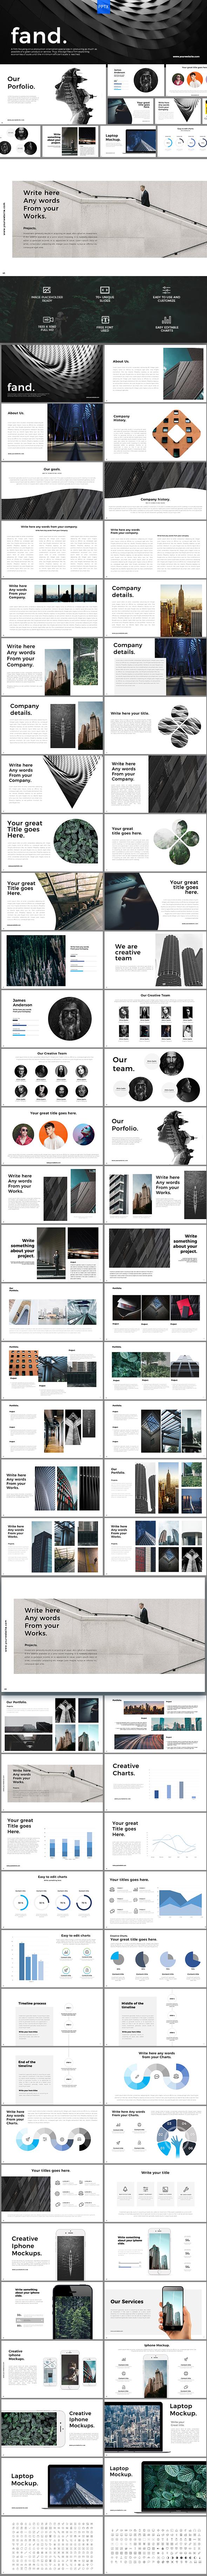 GraphicRiver Fand Powerpoint Presentation 20917503